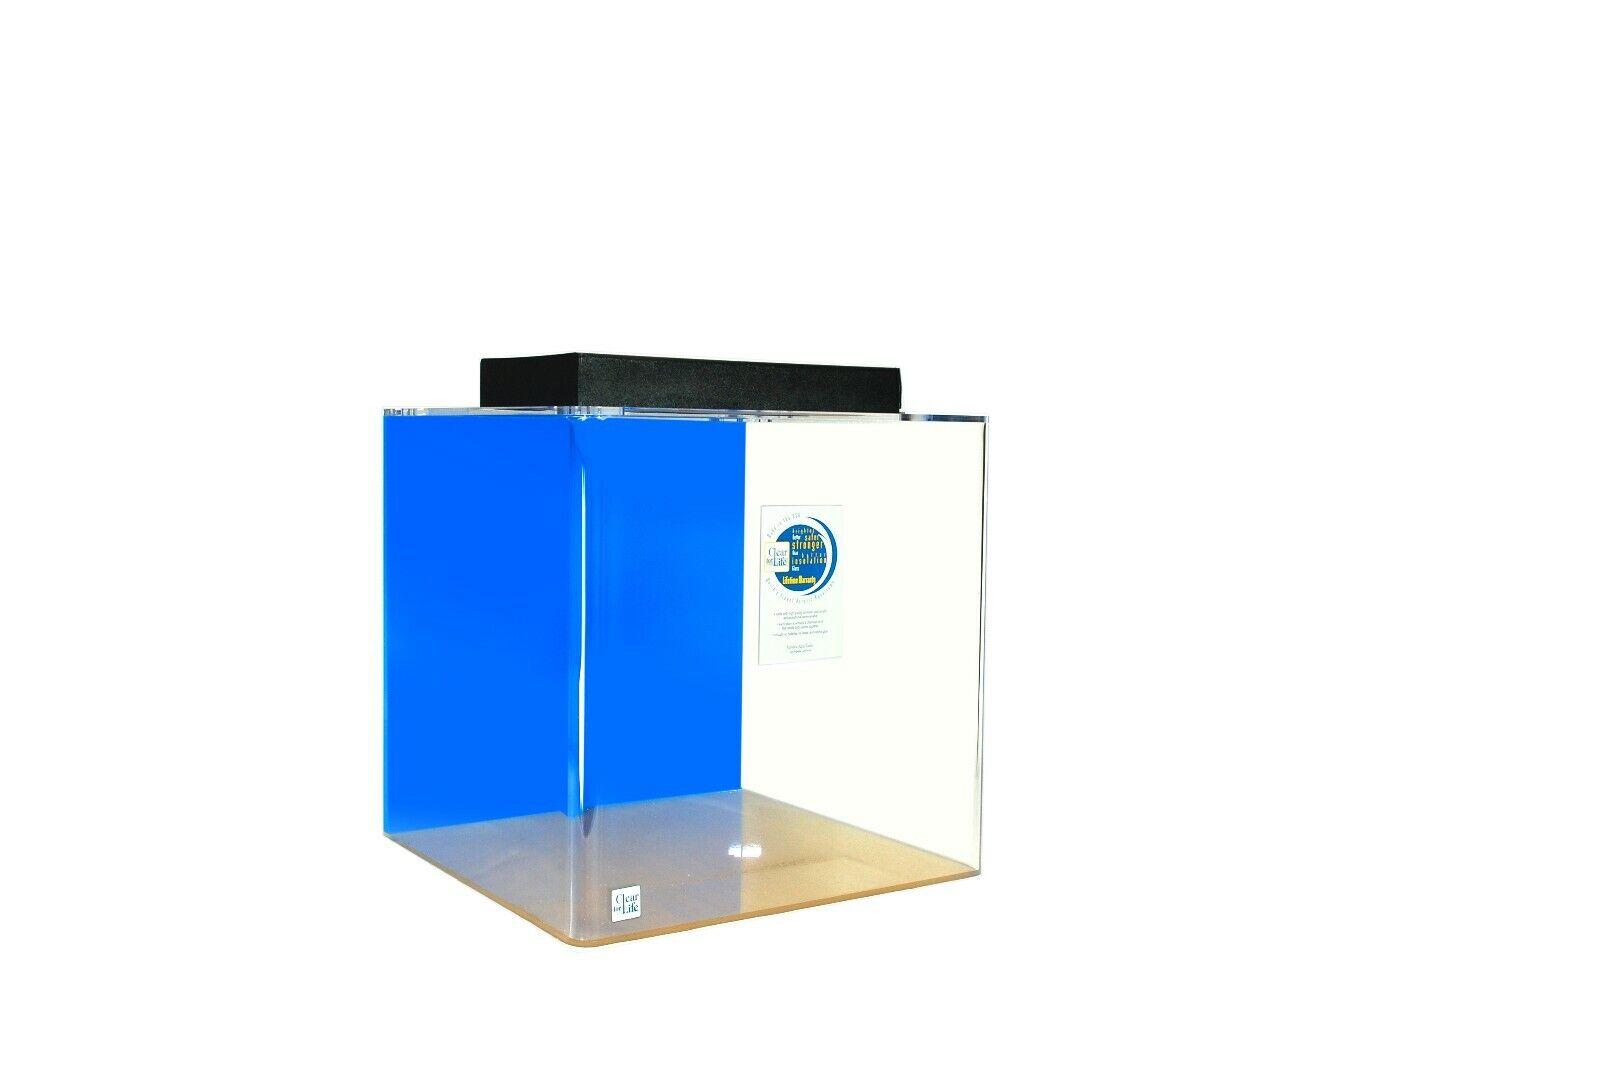 Aquarium  Acrylic  Cube  25 Gal Cube Tank 18 X 18 X 18 TALL